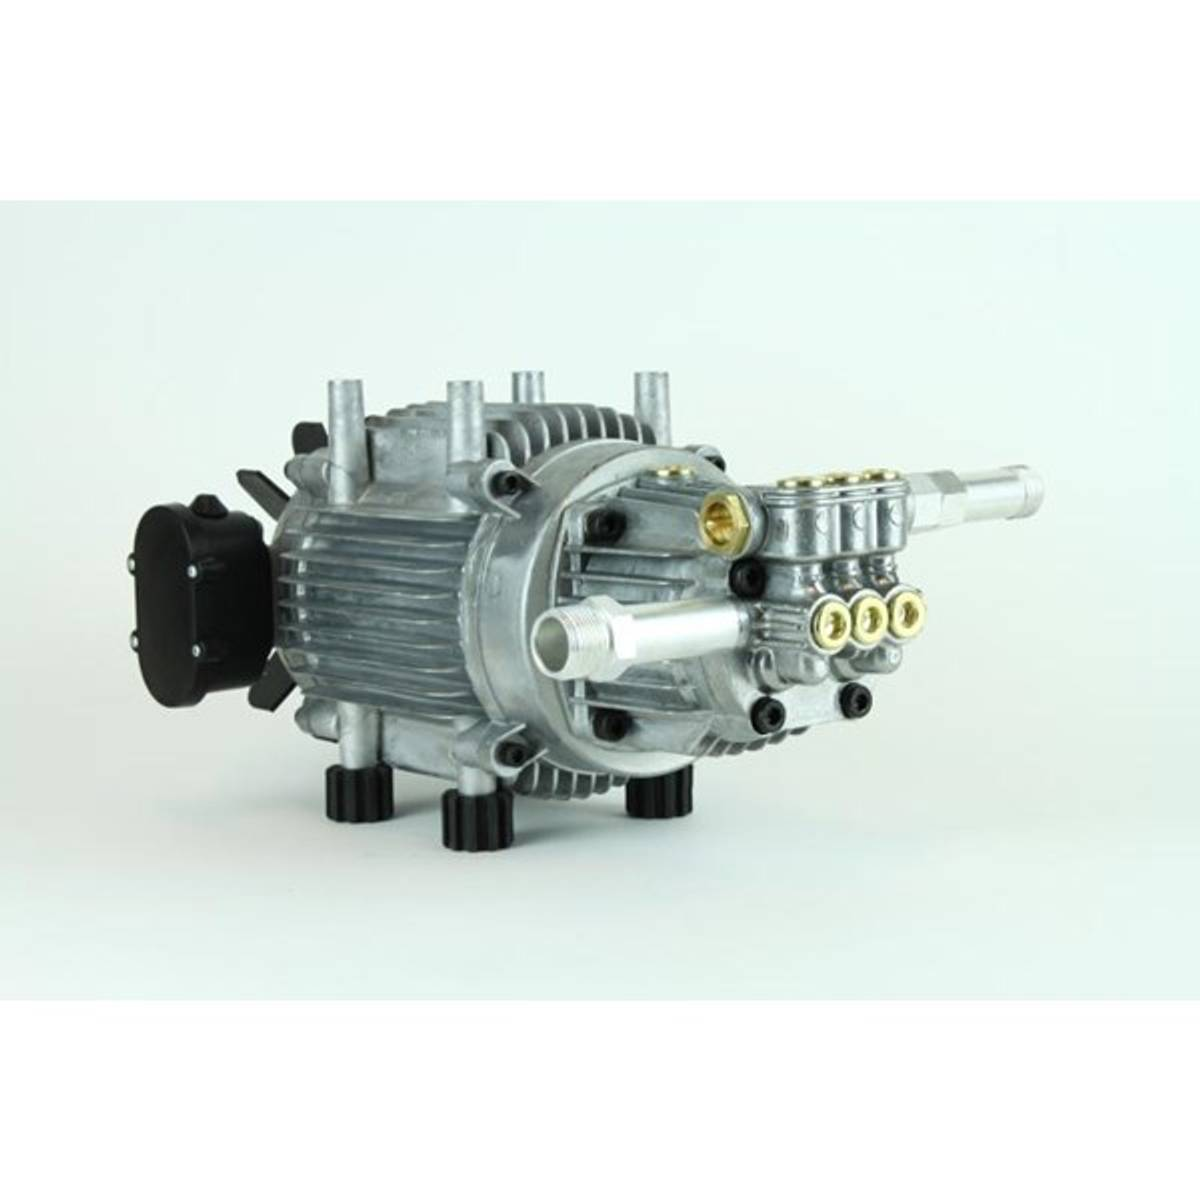 Foma høytrykksvasker PW-C22P I 1508 A-M 150 bar